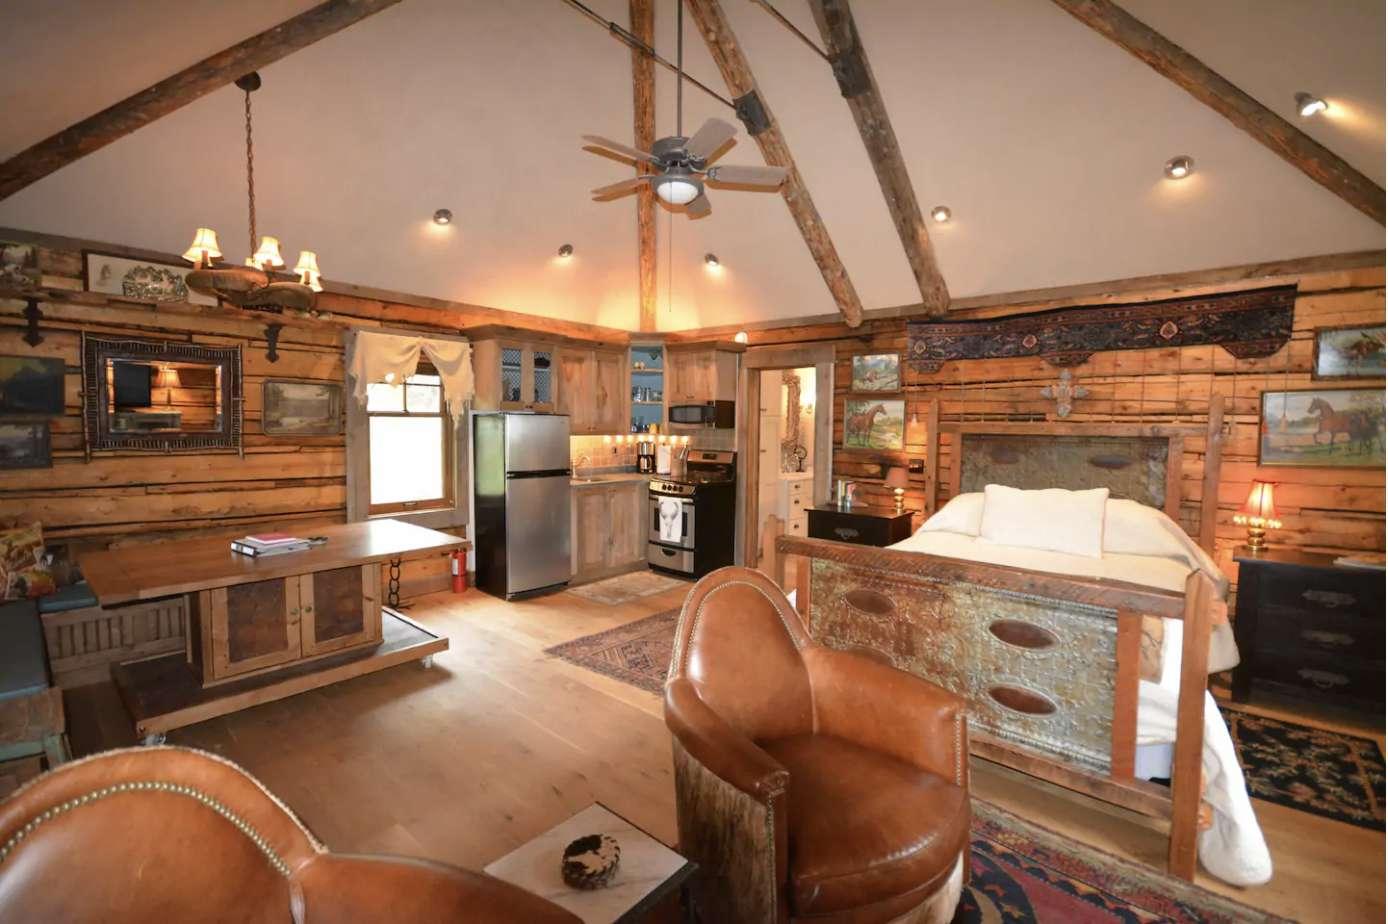 Artisan Studio Cabin Near Emigrant